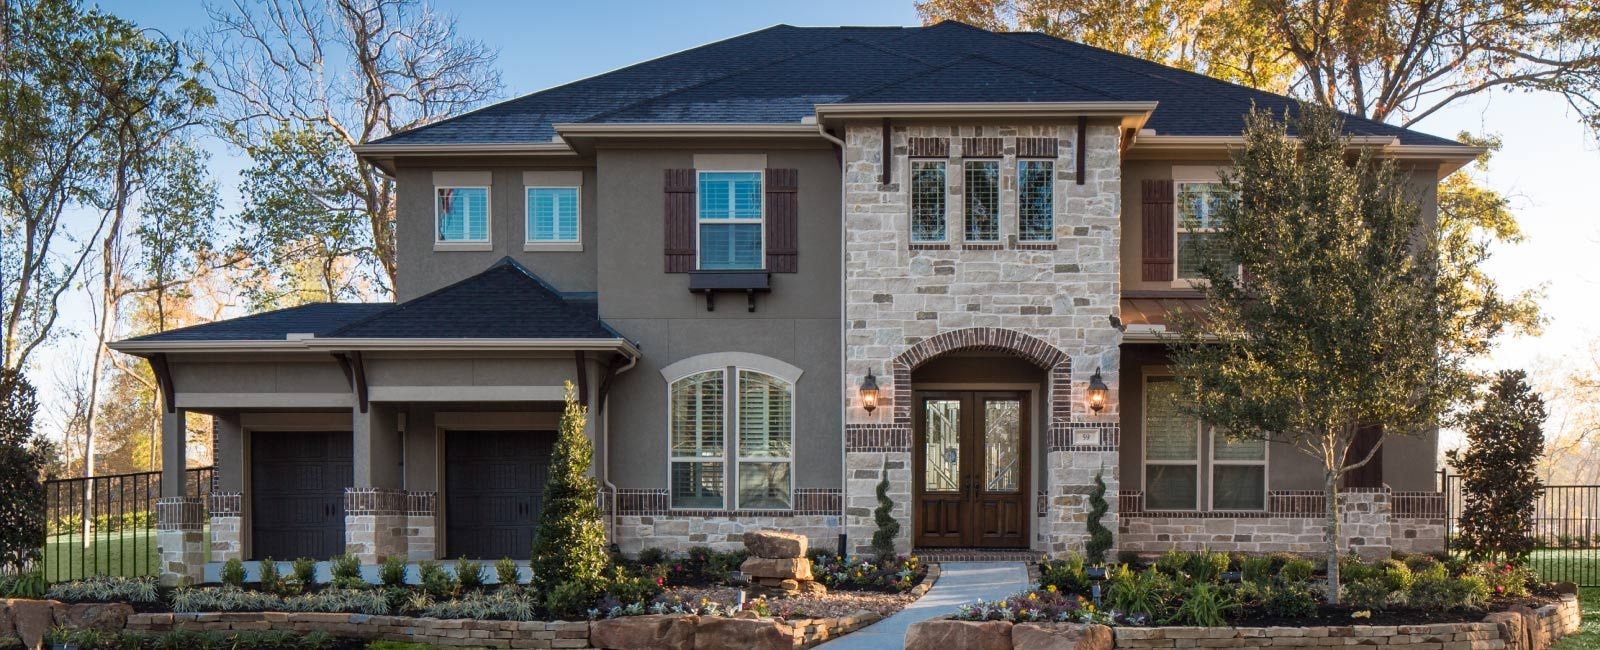 Executive Anvil Missouri city, House styles, New homes